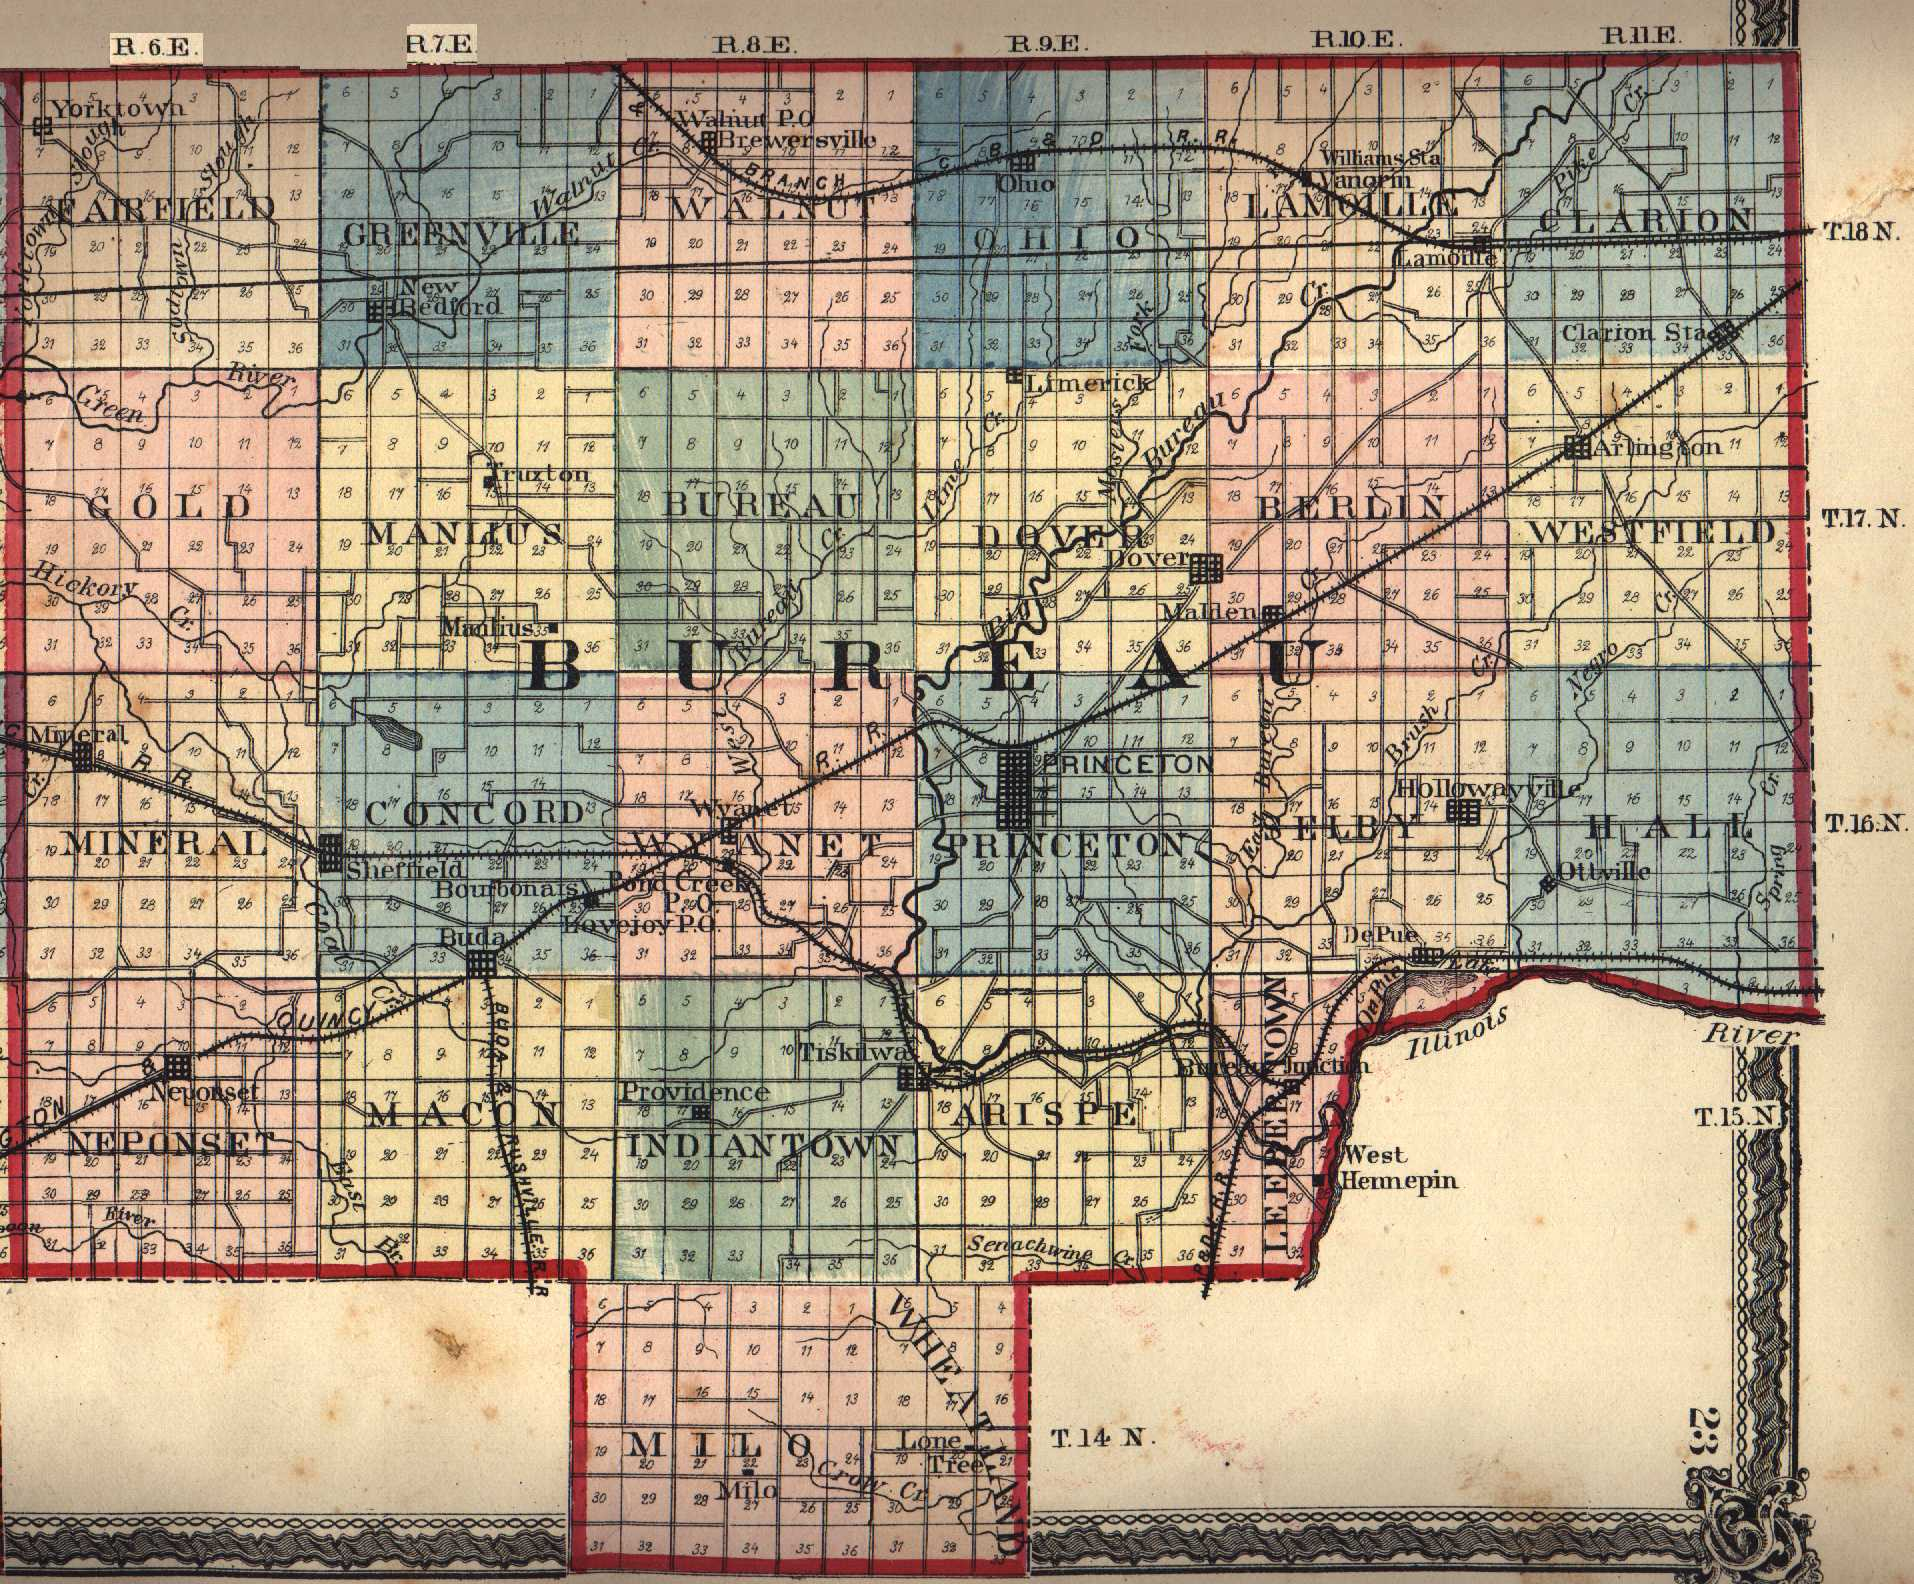 Illinois bureau county princeton - 1876 Landowner Map Bureau County Source Maps Of The Past 7 5 Minute Topographic Maps In Bureau County Identifies Cemeteries